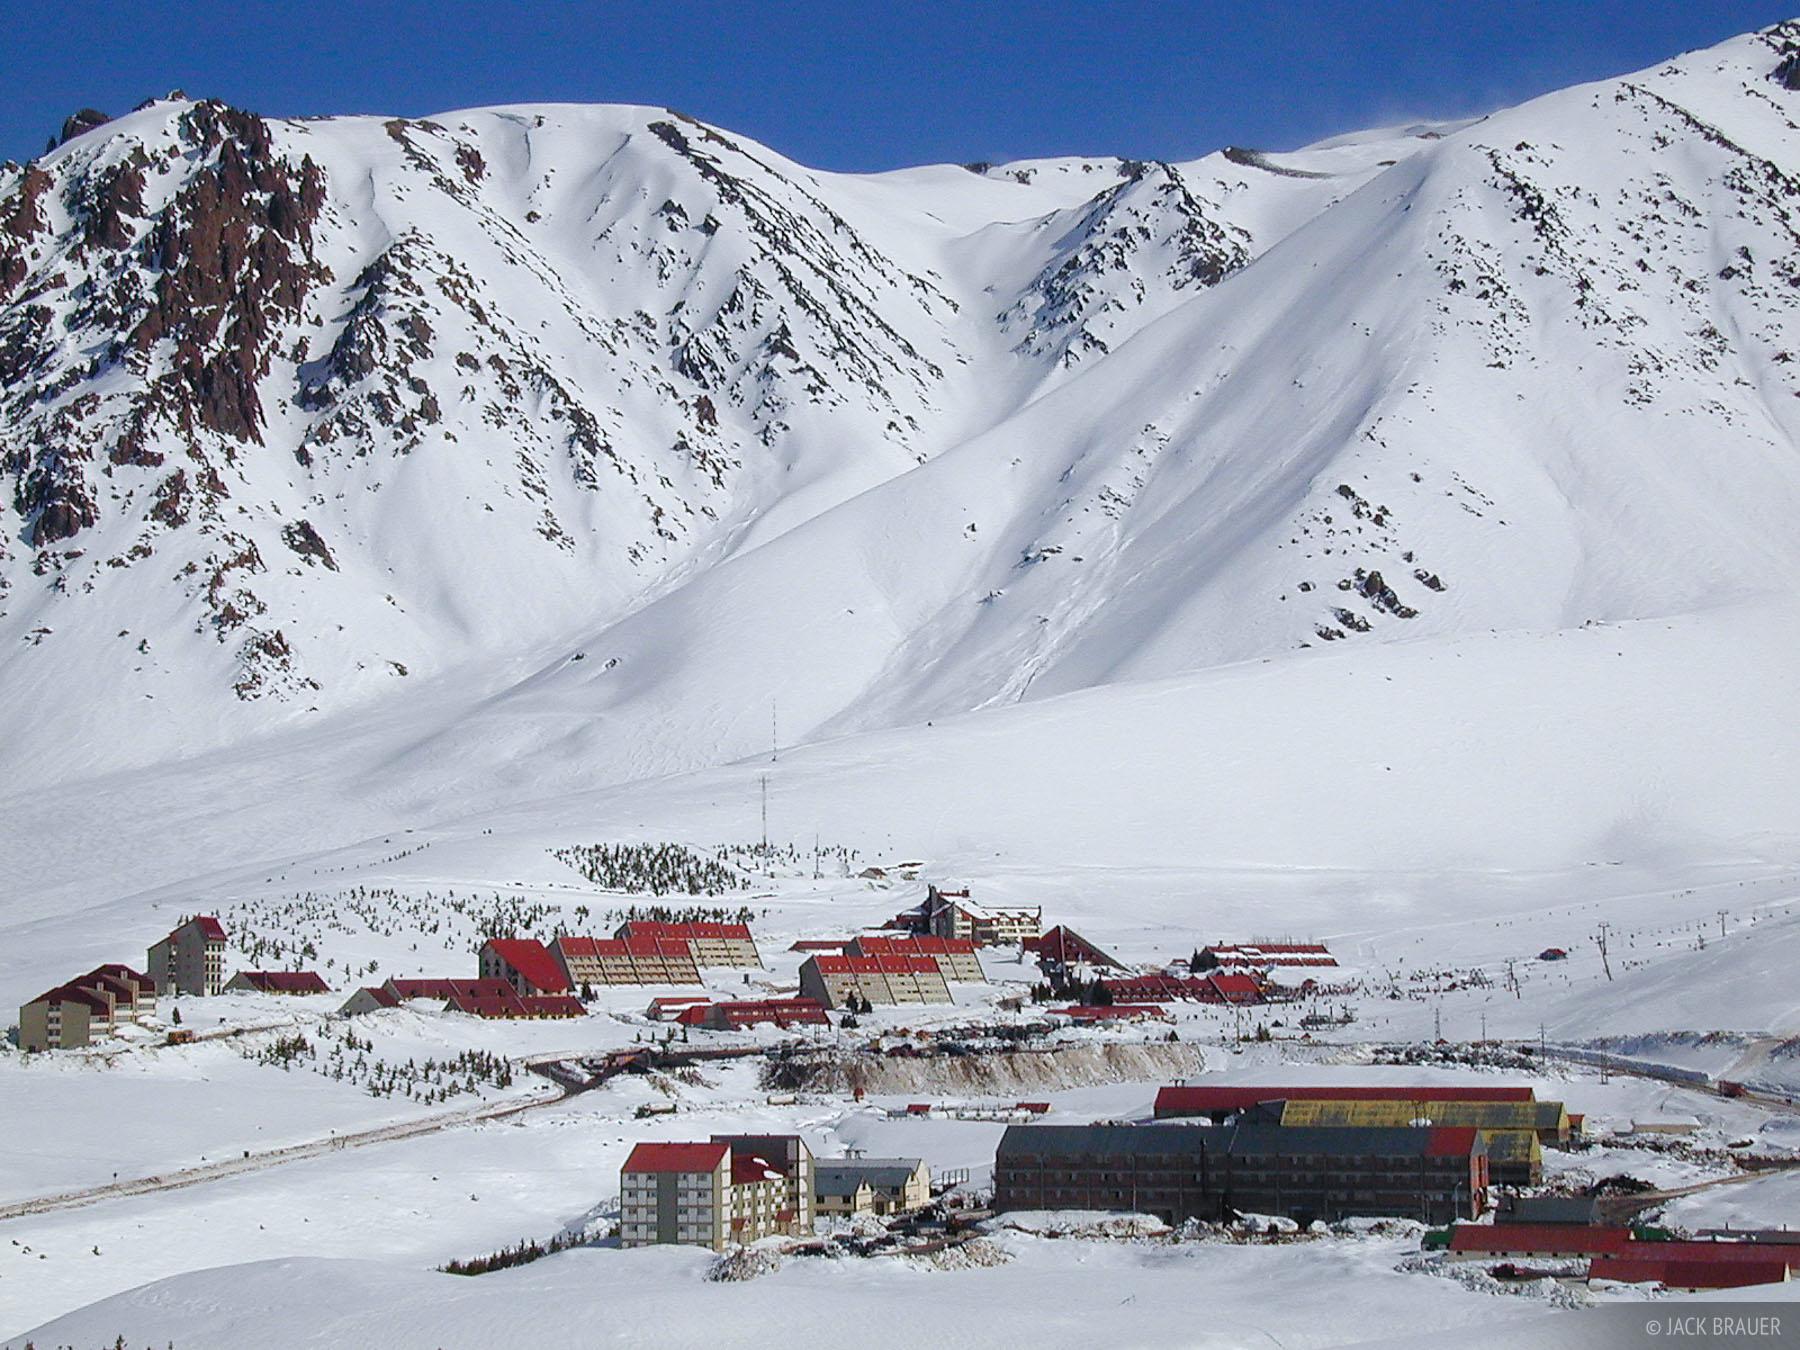 ski resort, Argentina, Las Leñas, photo